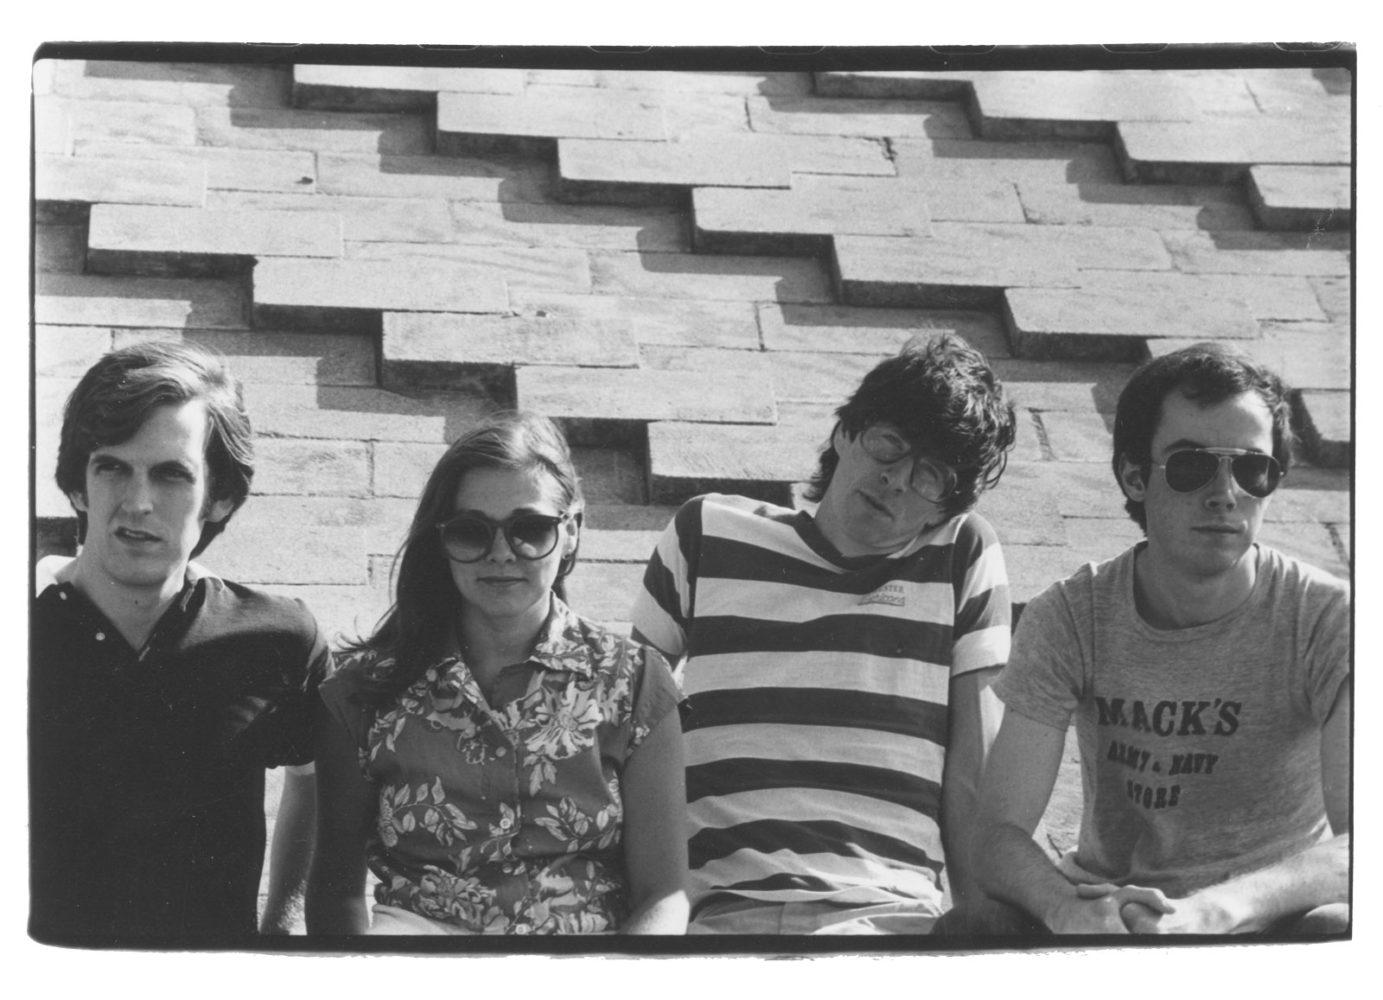 Ned Hoskin - guitar/vocals,Peggi Fournier - saxophone/farfisa/vocals, Paul Dodd - drums, Martin Edic - bass. Hi-Techs promo photo for promotional postcard. Photo by Linnae Fischer.